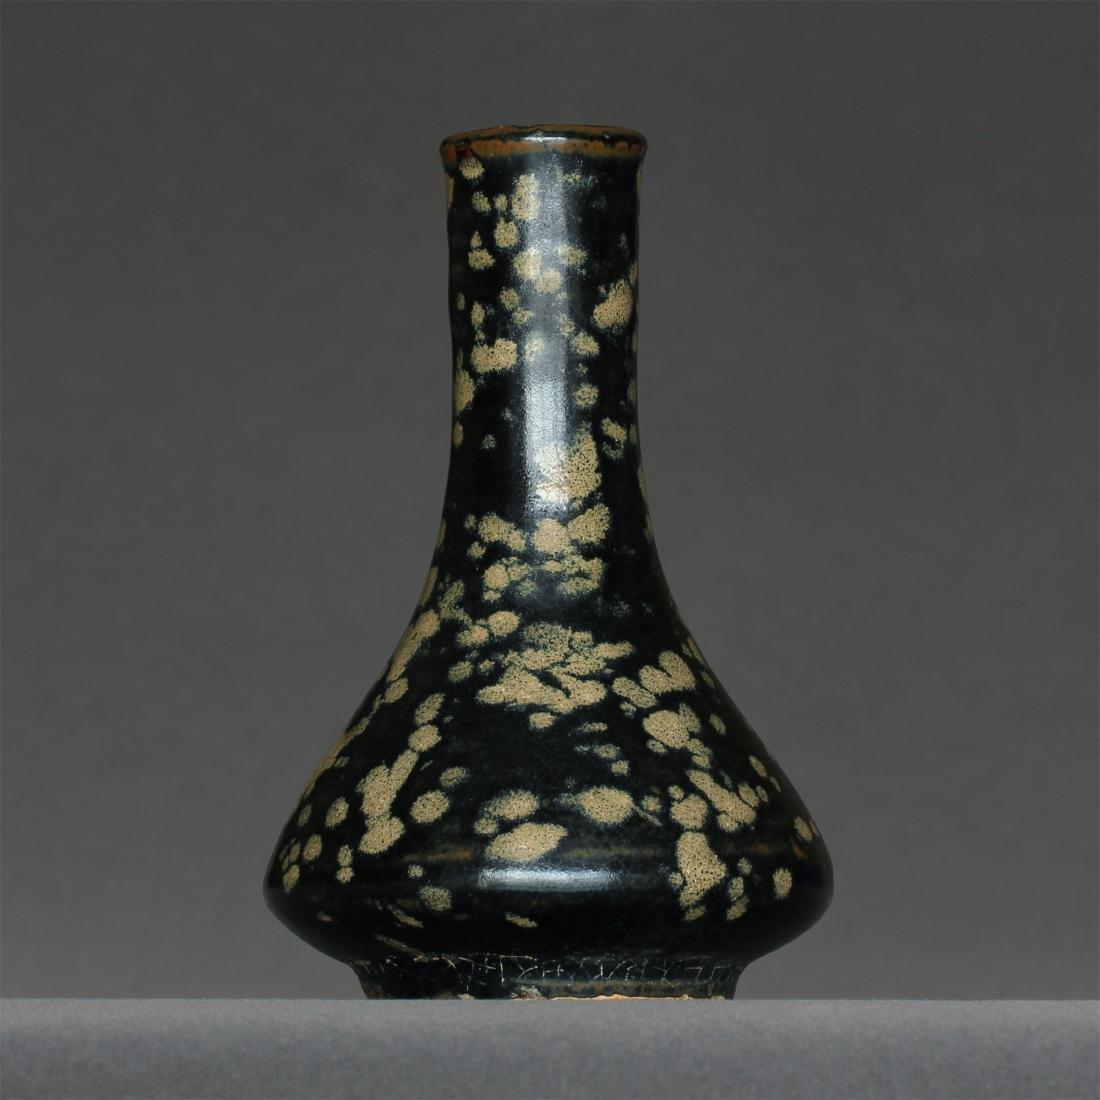 A JiZhou-Kiln Small Vase. Measure(inch), Height: 4-3/4